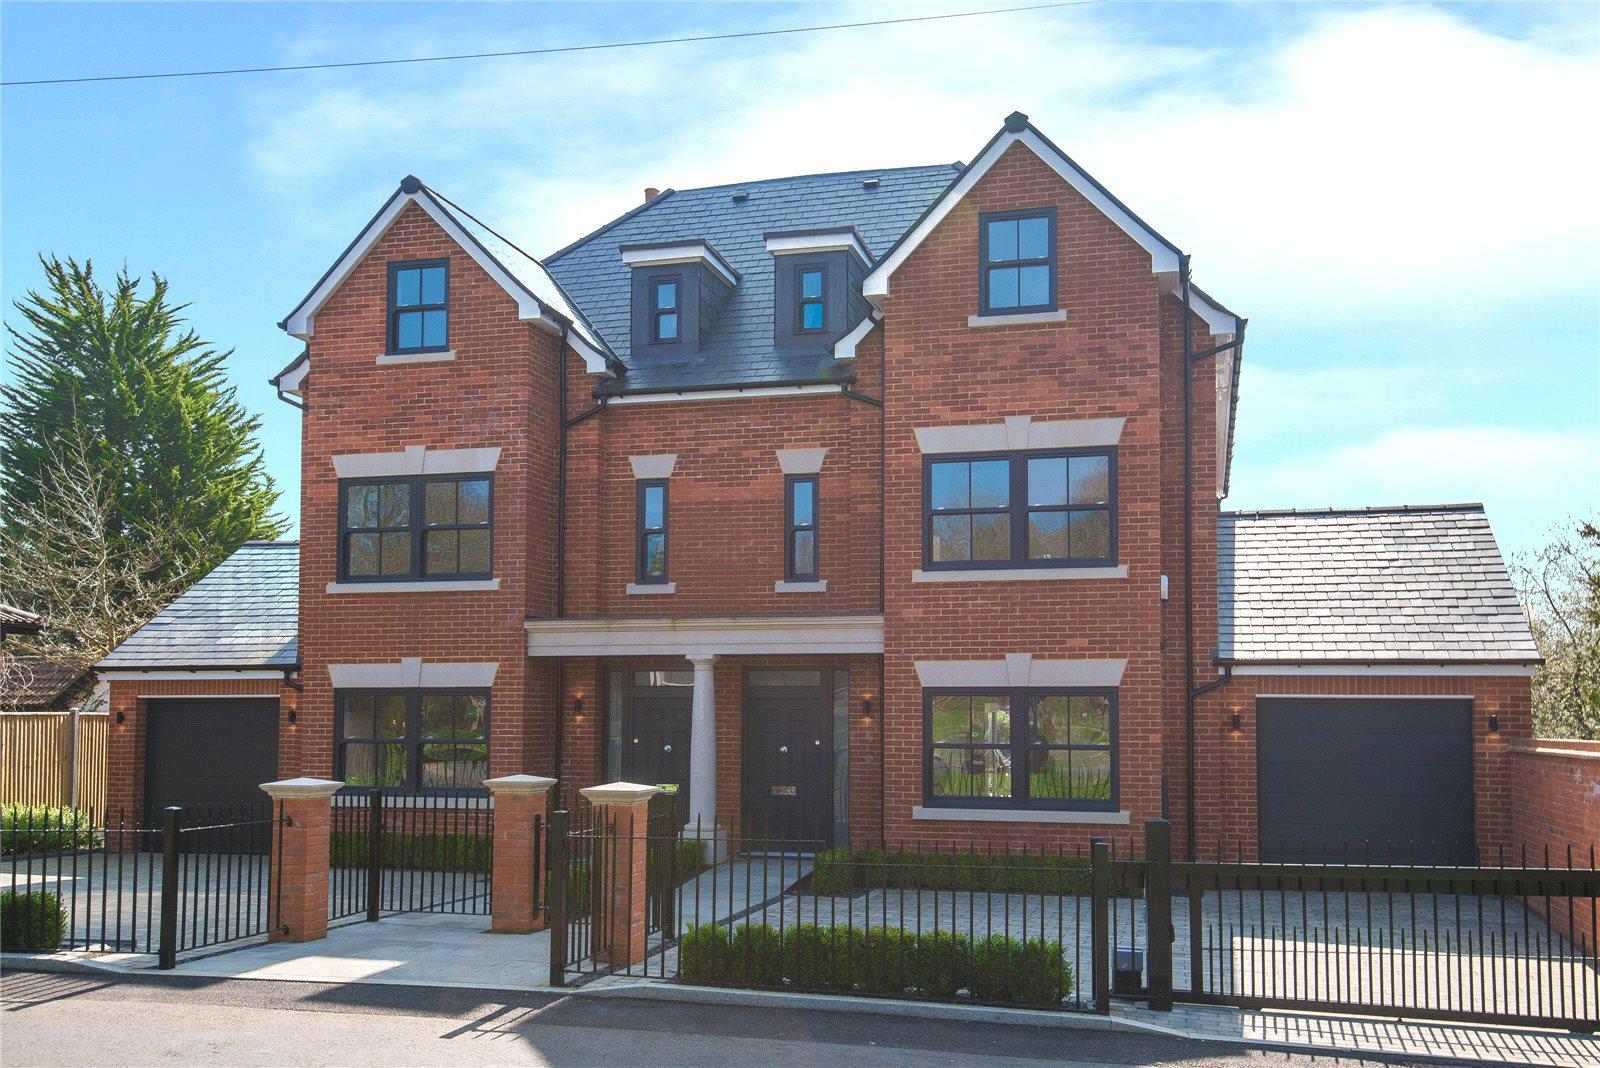 Additional photo for property listing at Stag House, Hawthorne Lane, Farnham Common, Buckinghamshire, SL2 Farnham Common, England